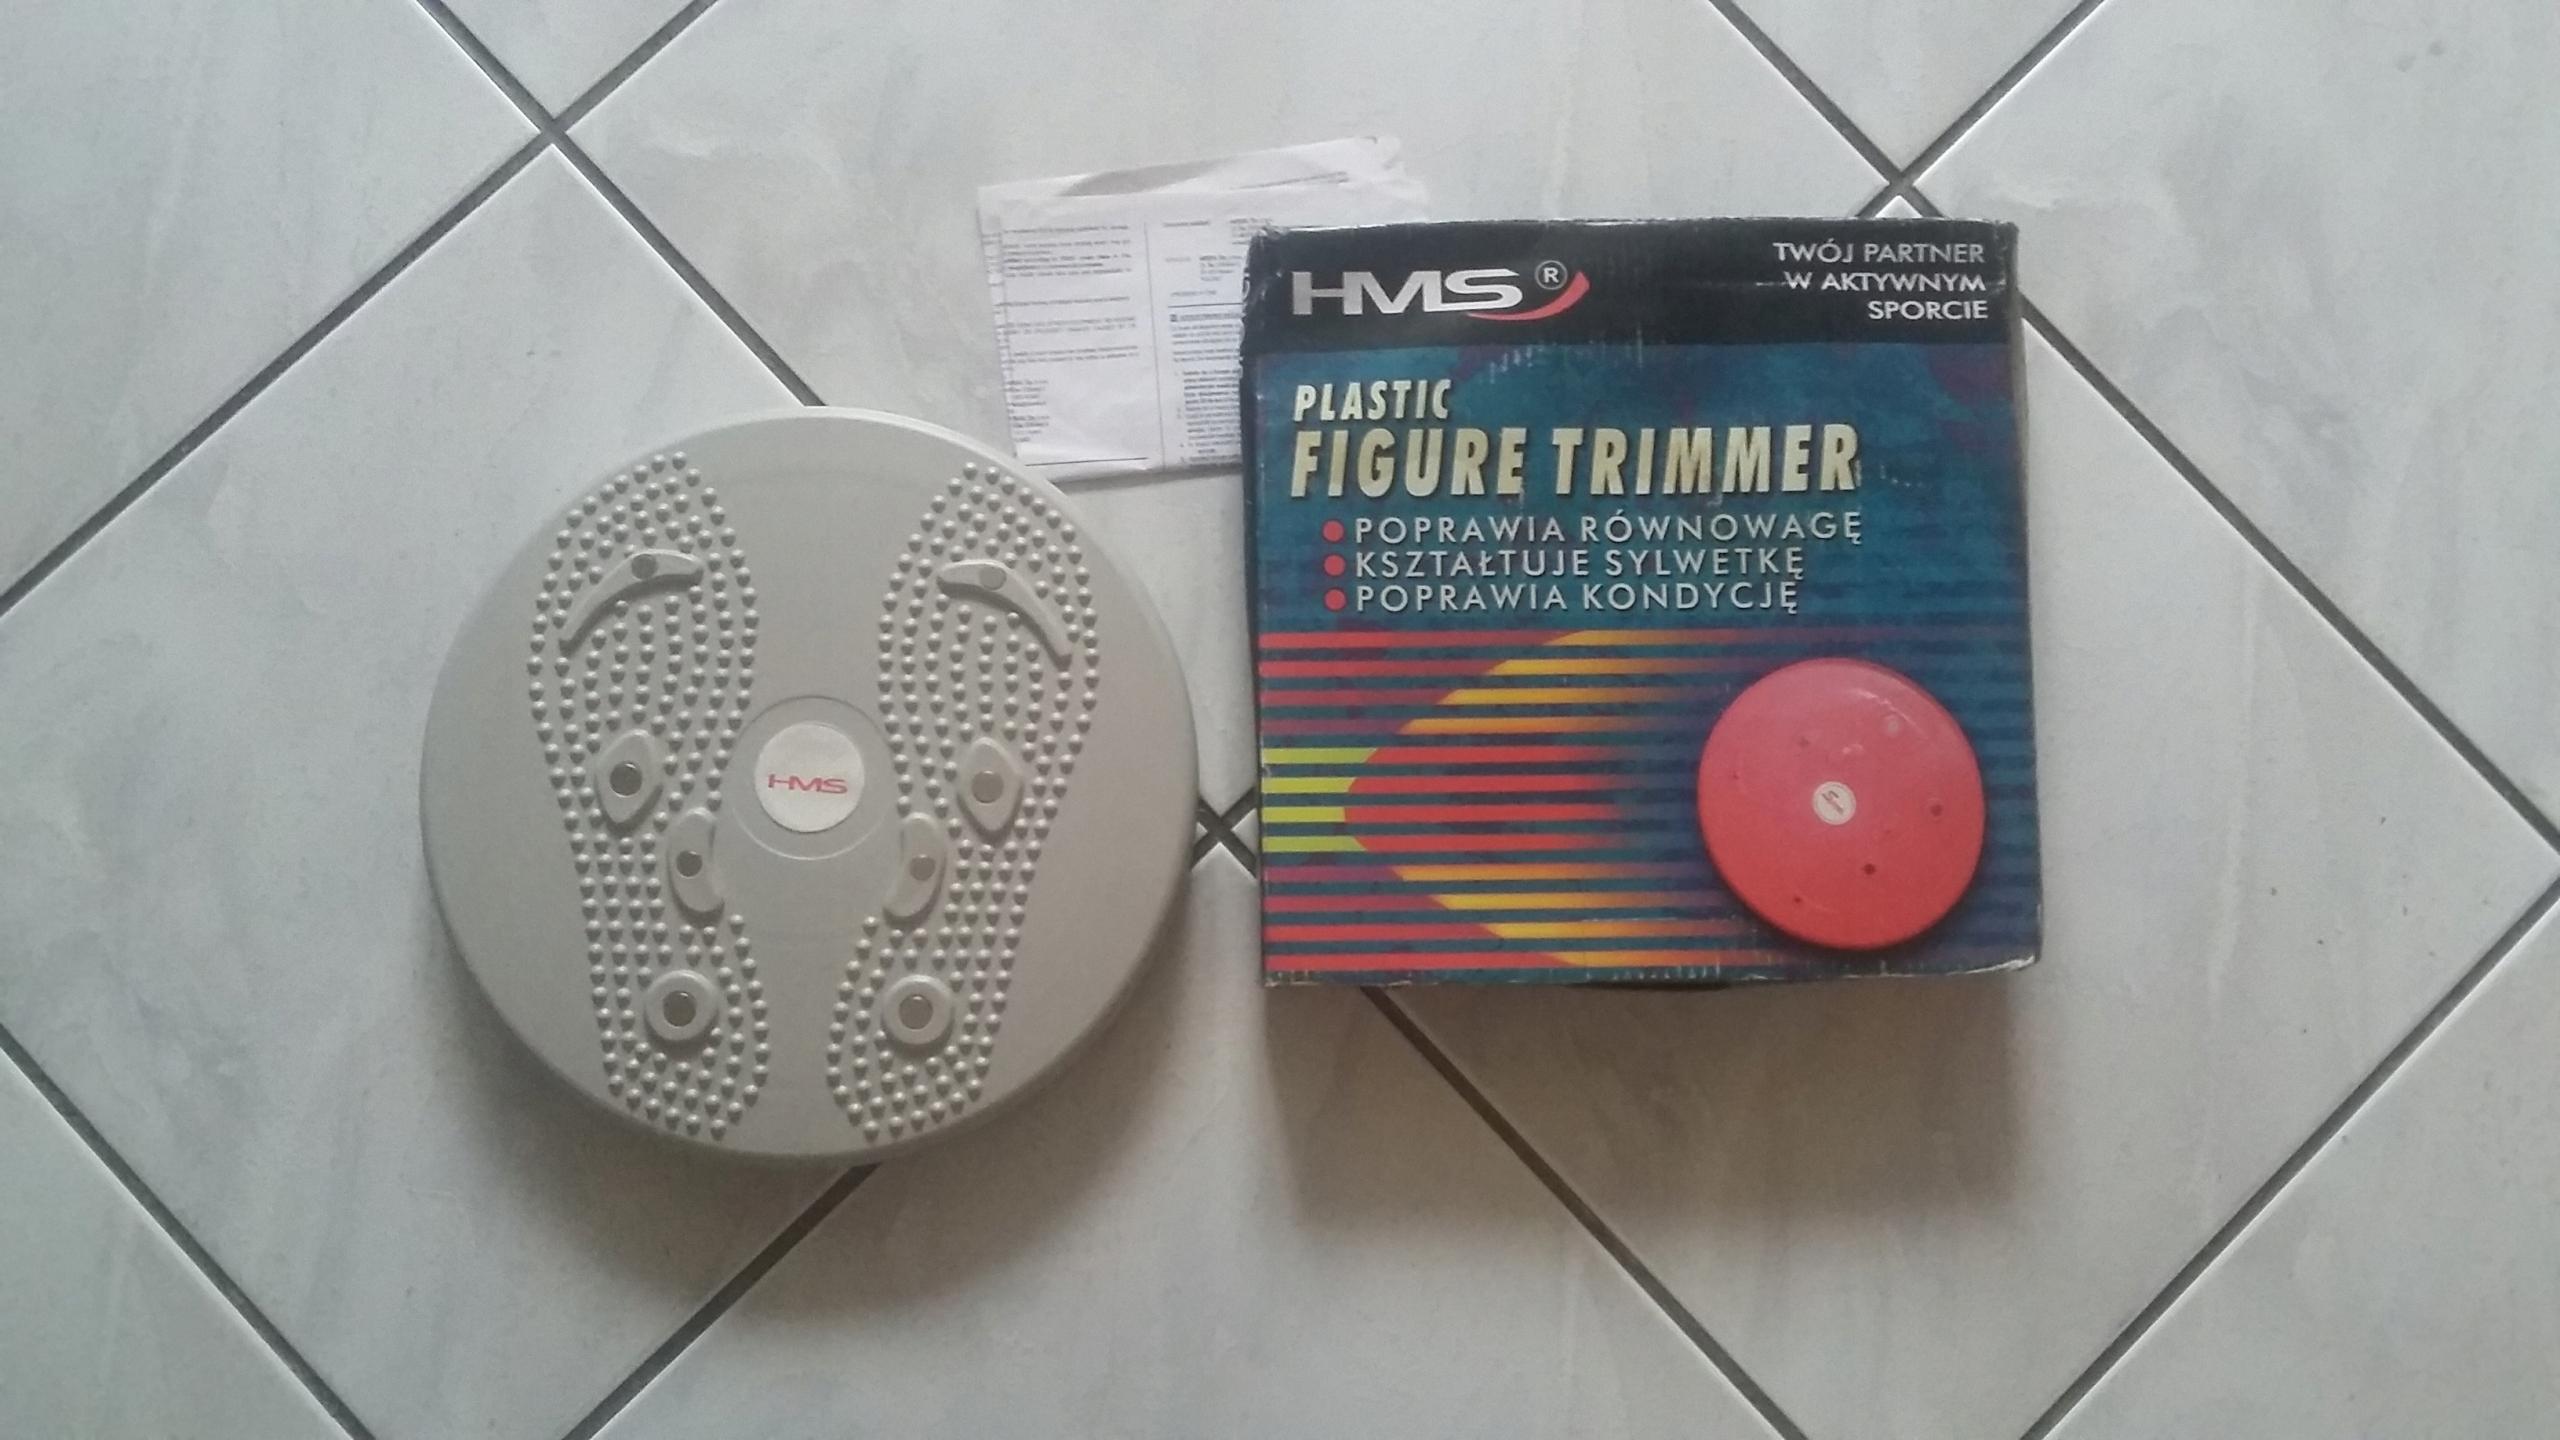 HMS Plastic Figure Timmer twój partner w sporcie